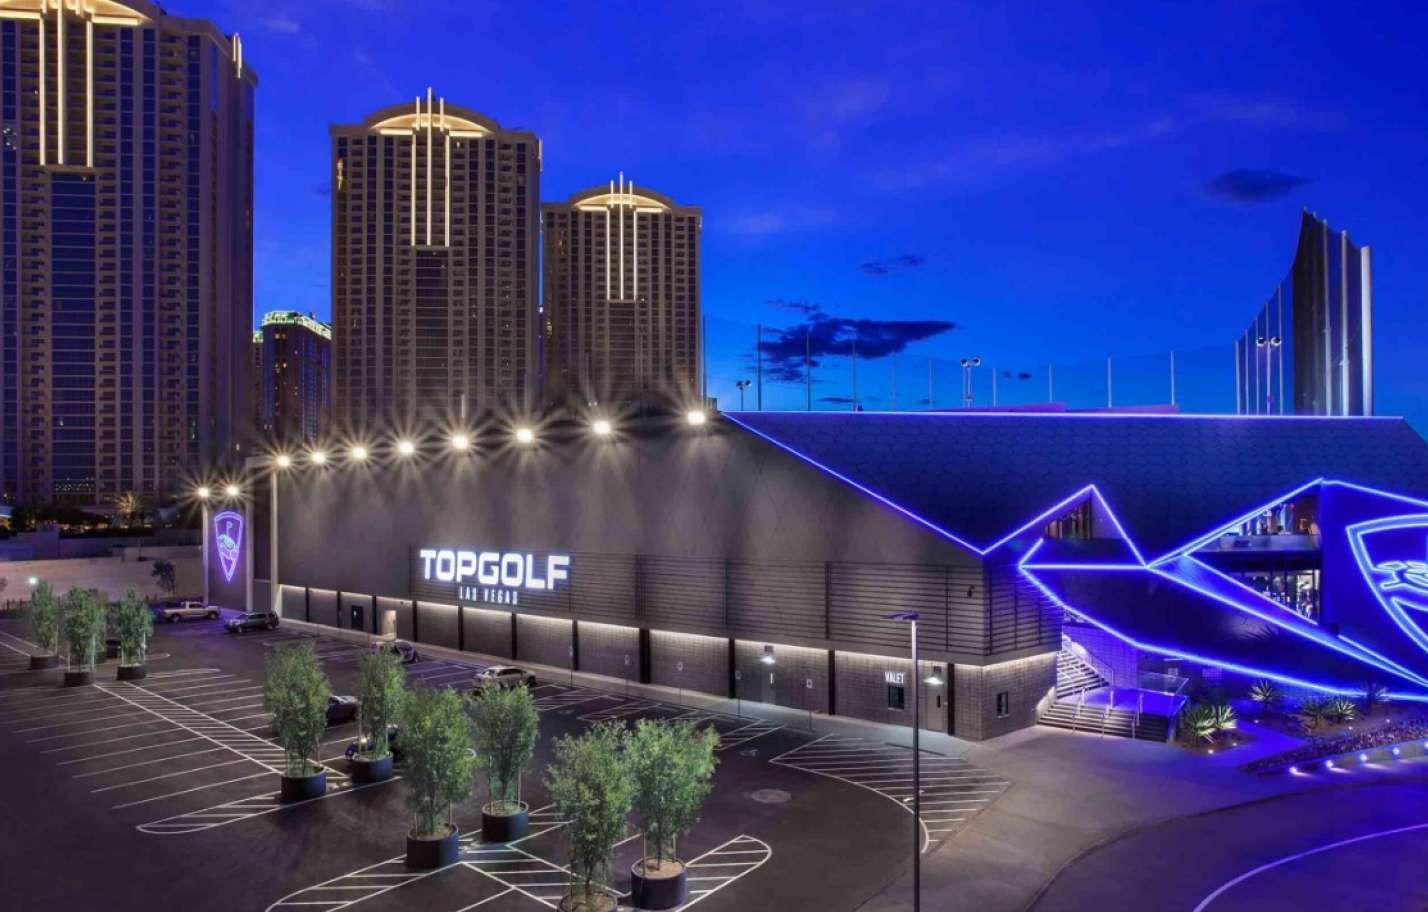 Topgolf Mgm Grand Las Vegas Top Golf Mgm Grand Las Vegas Golf Videos